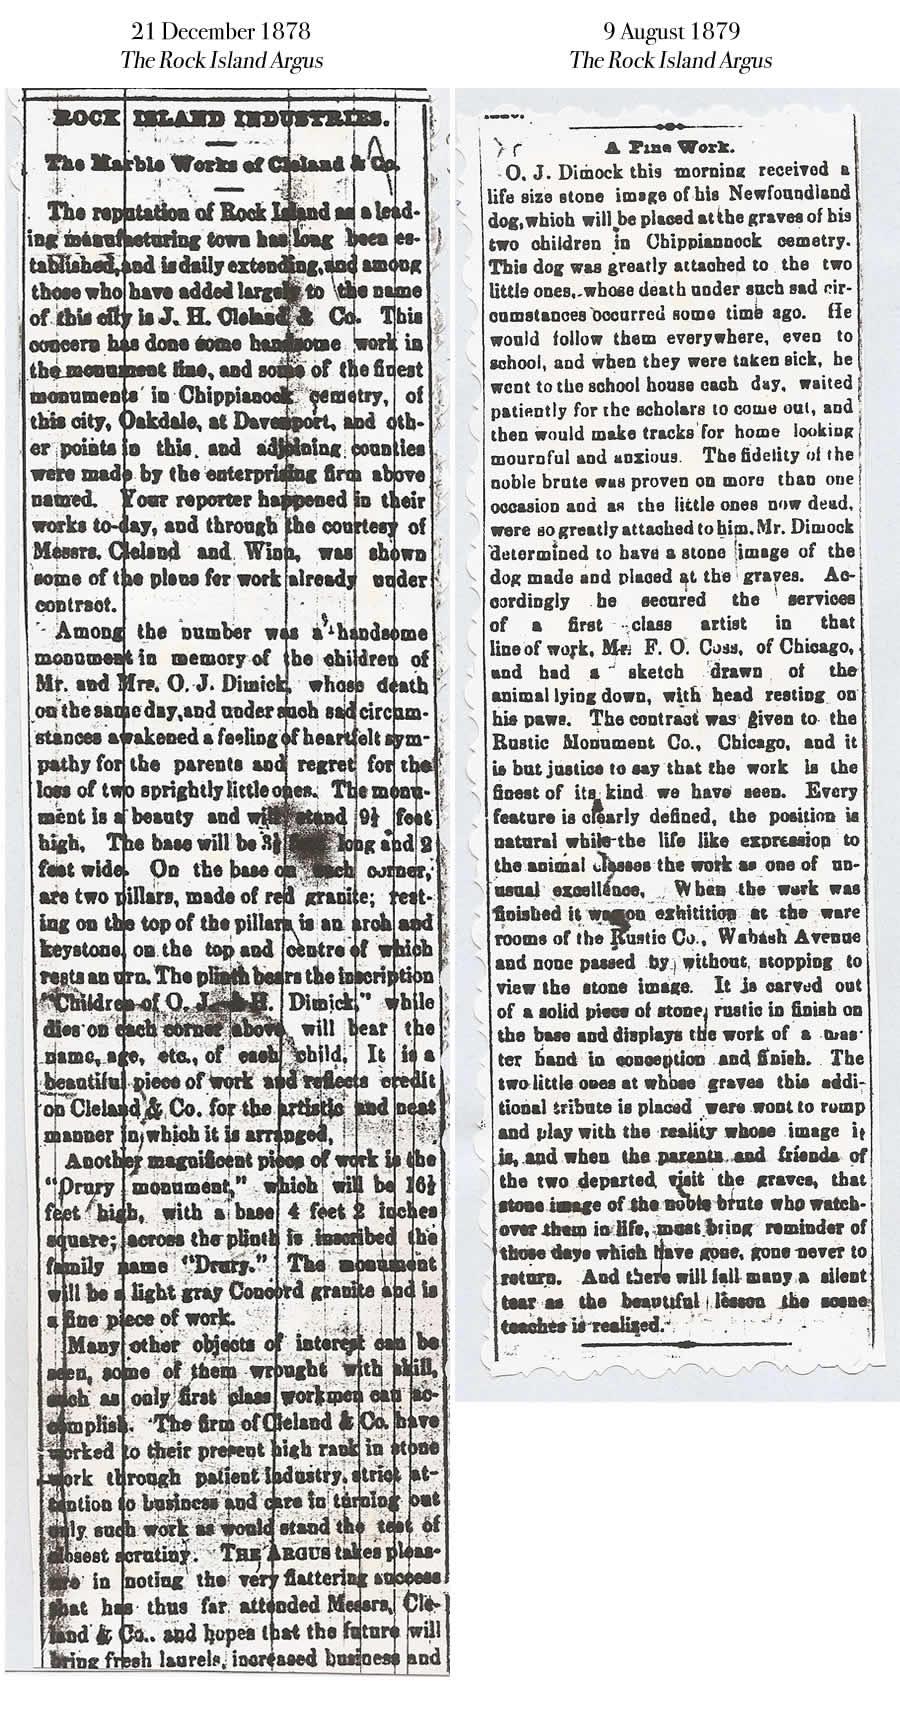 Dimick Dog Statue Chippiannock Newspaper Articles